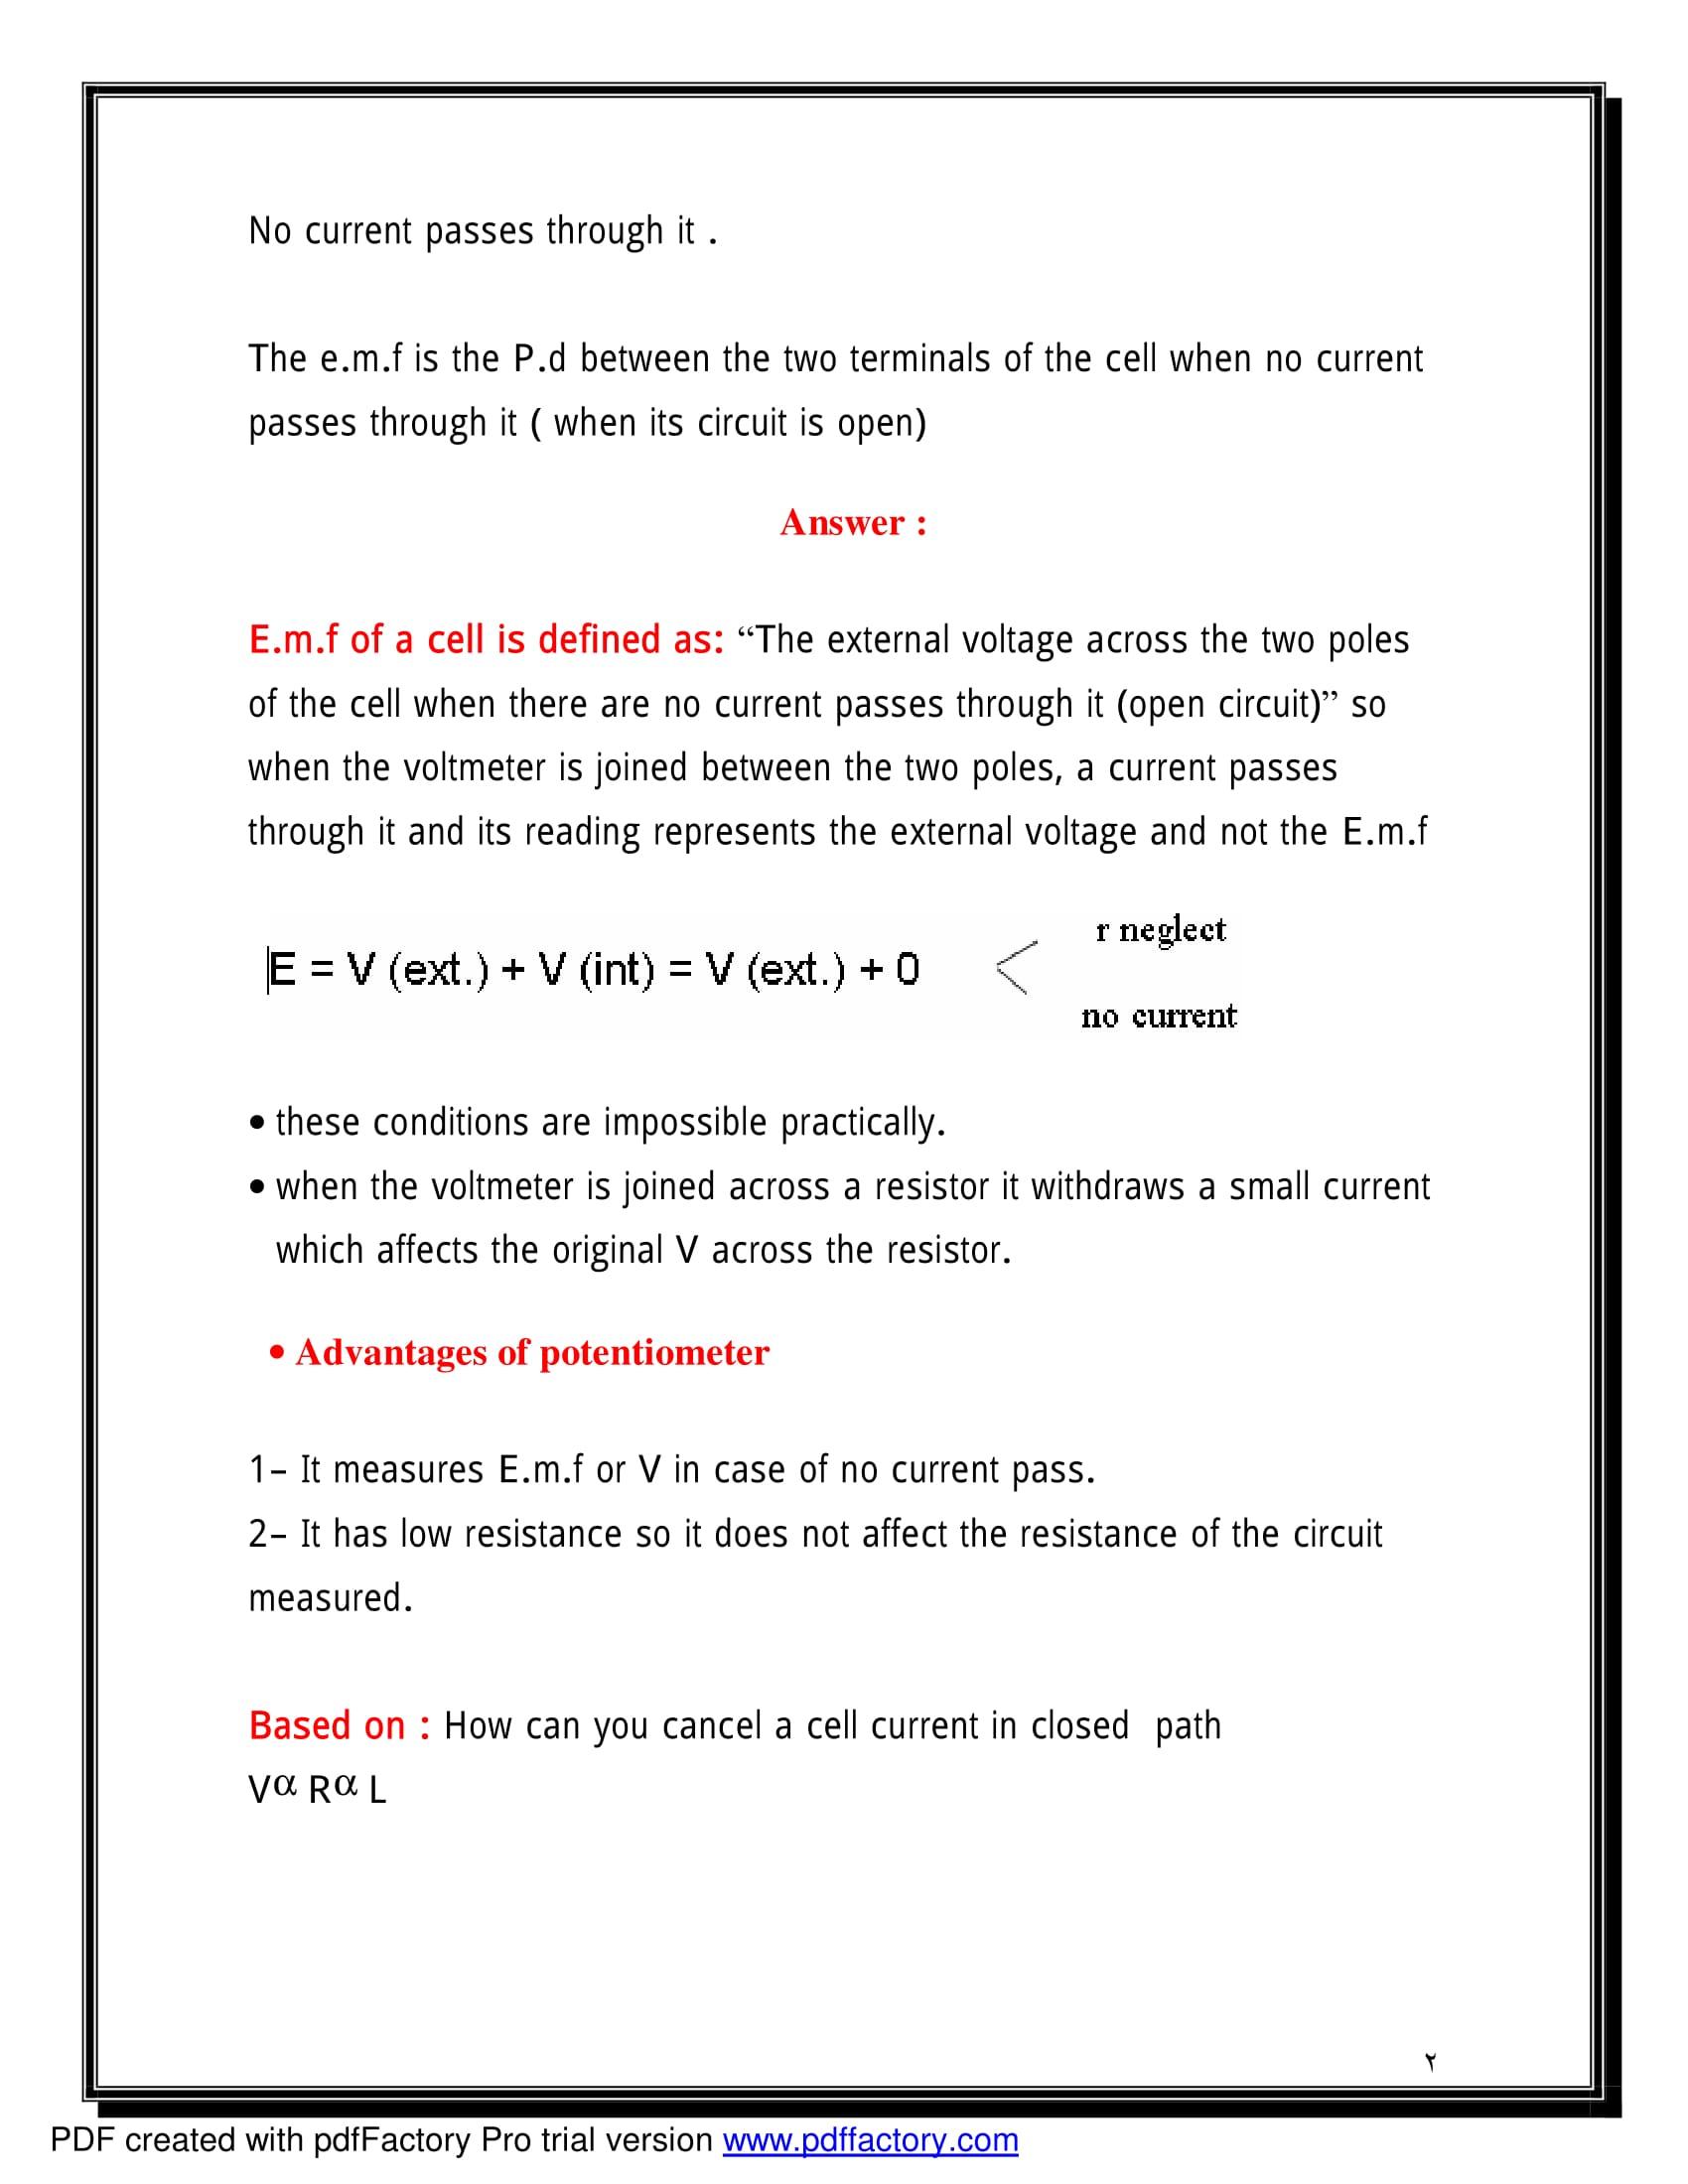 exam-eg.com_1512391676911.jpg